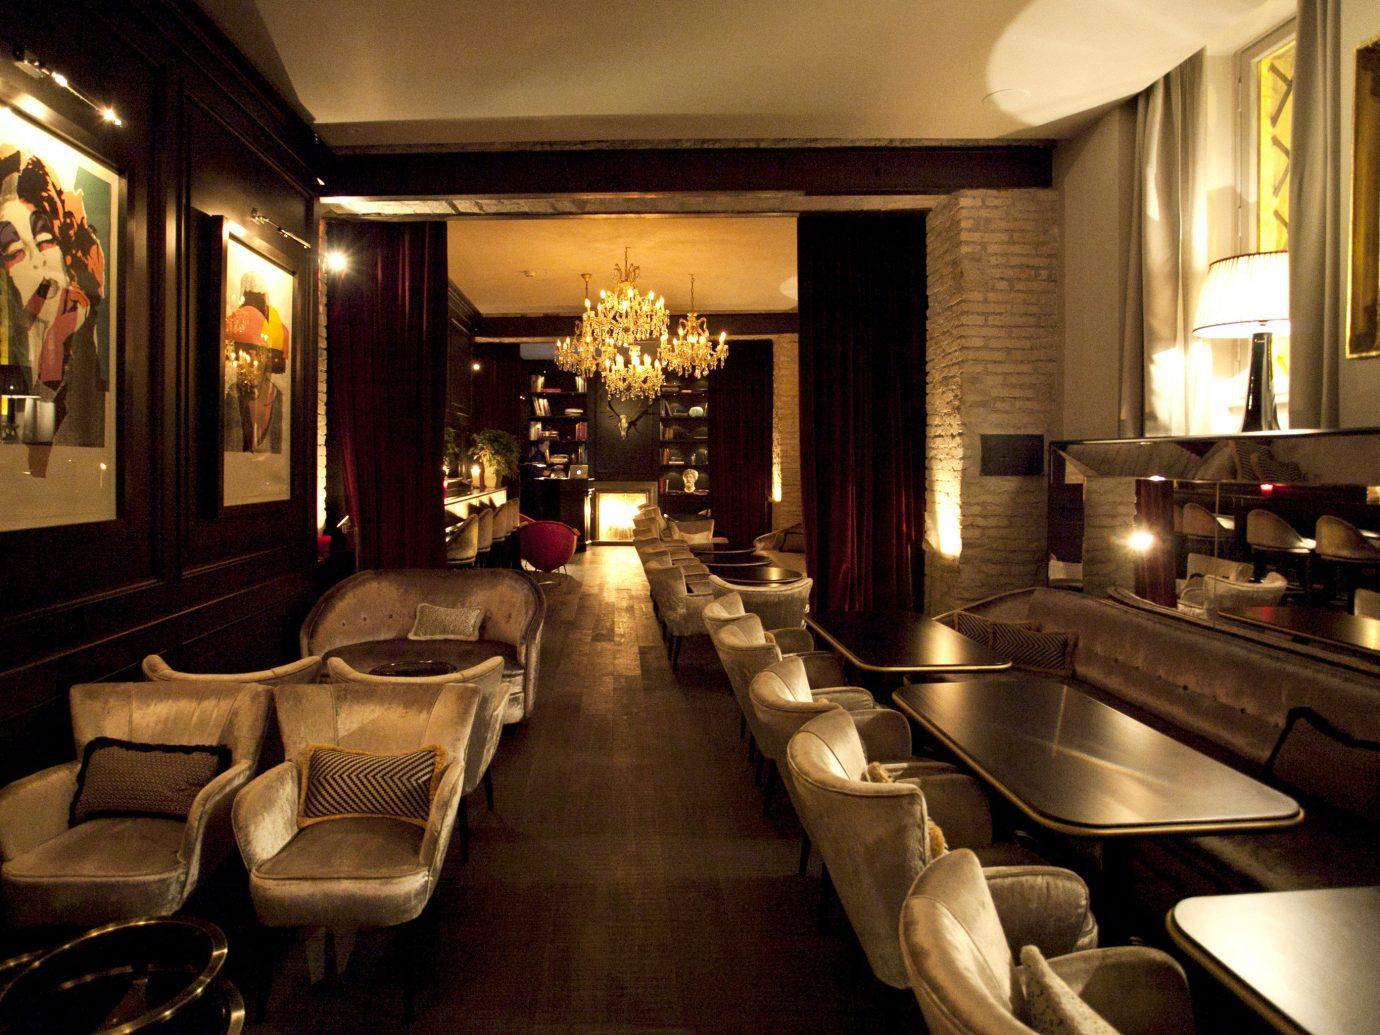 Boutique Hotels Hotels indoor floor room interior design window restaurant Bar Lobby café furniture